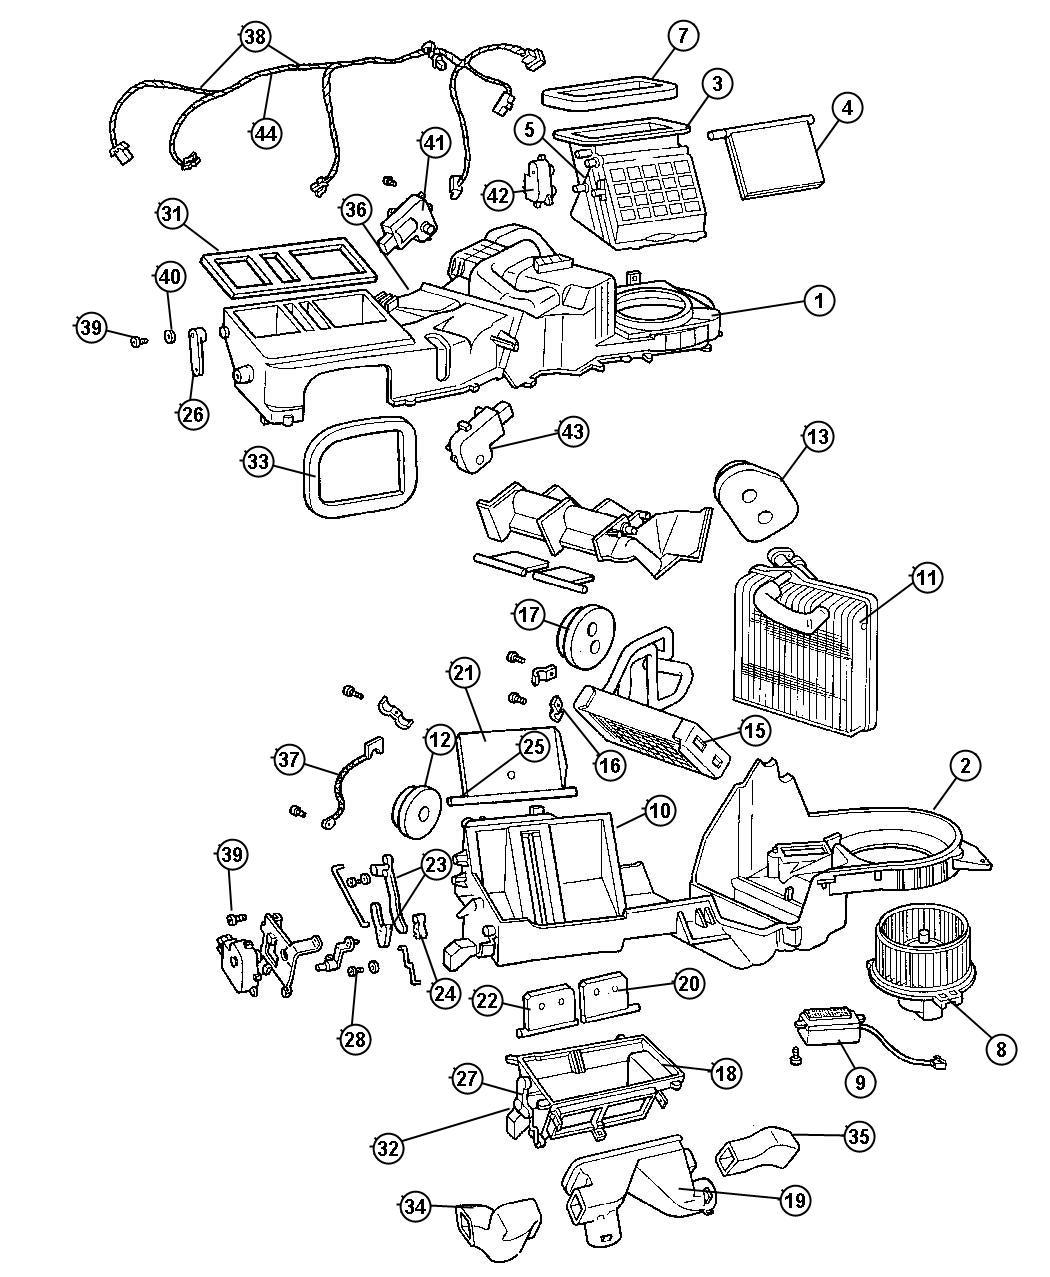 tags: #jeep cherokee heater diagram#cj7 heater diagram#jeep wrangler heater  core diagram#jeep cj7 parts#jeep cj7 carburetor diagram#jeep cj air